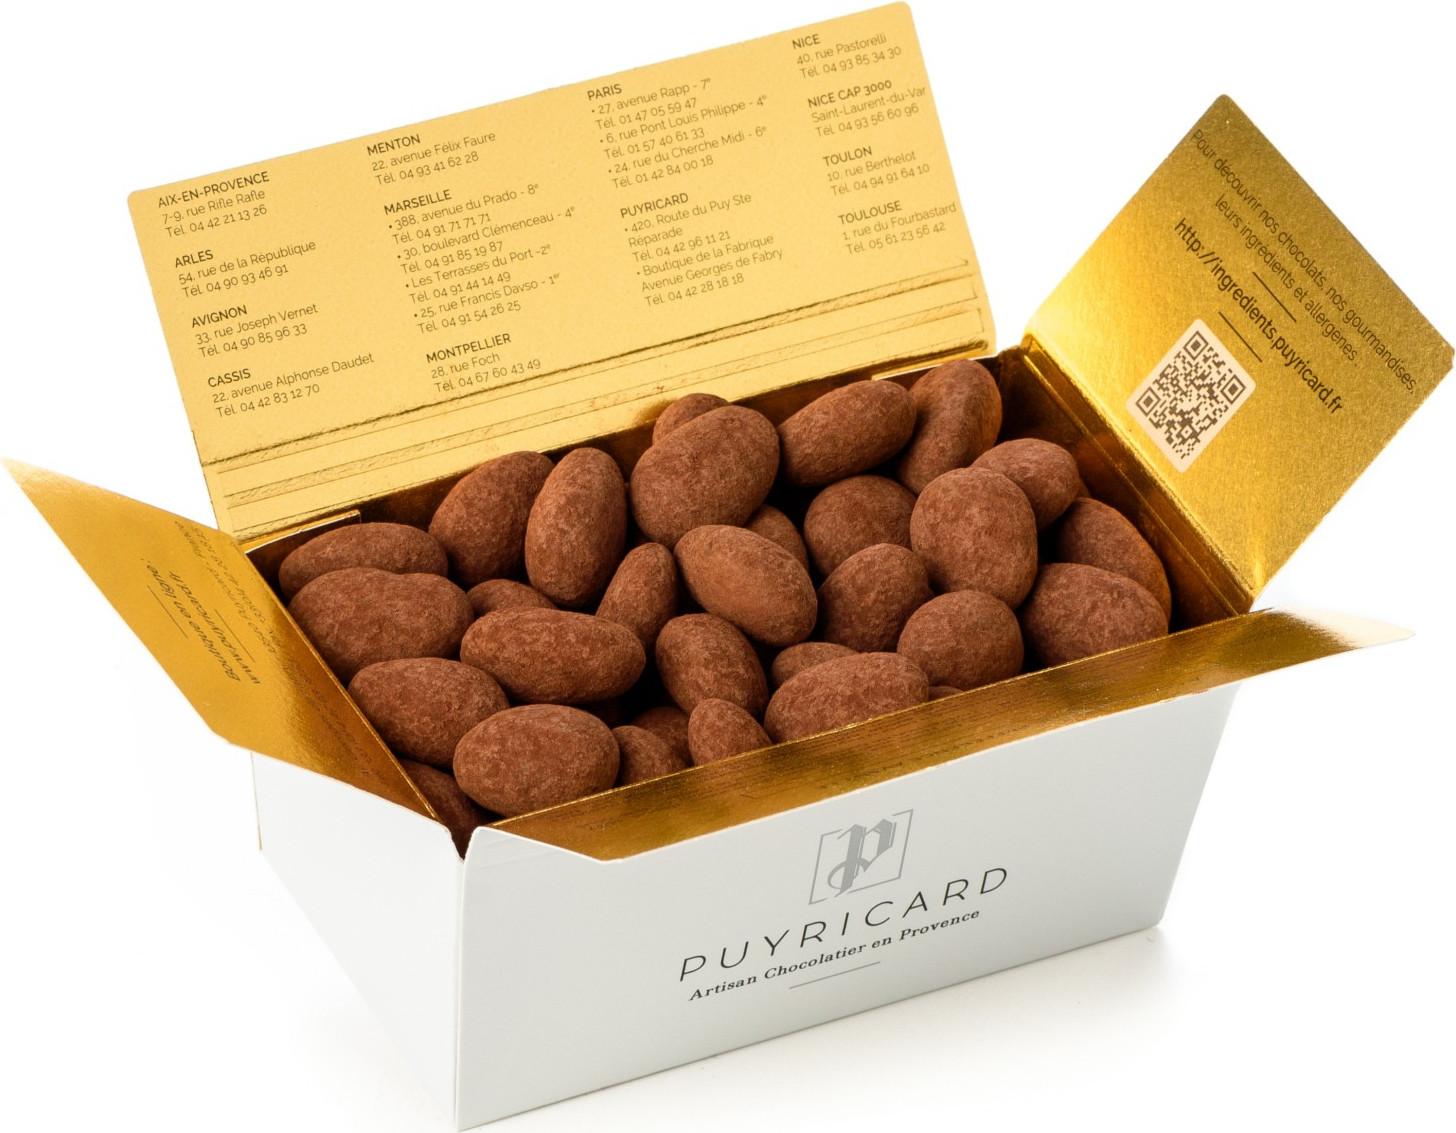 Ballotin d'Amandas Avelinas pâte de truffe cacao 1kg